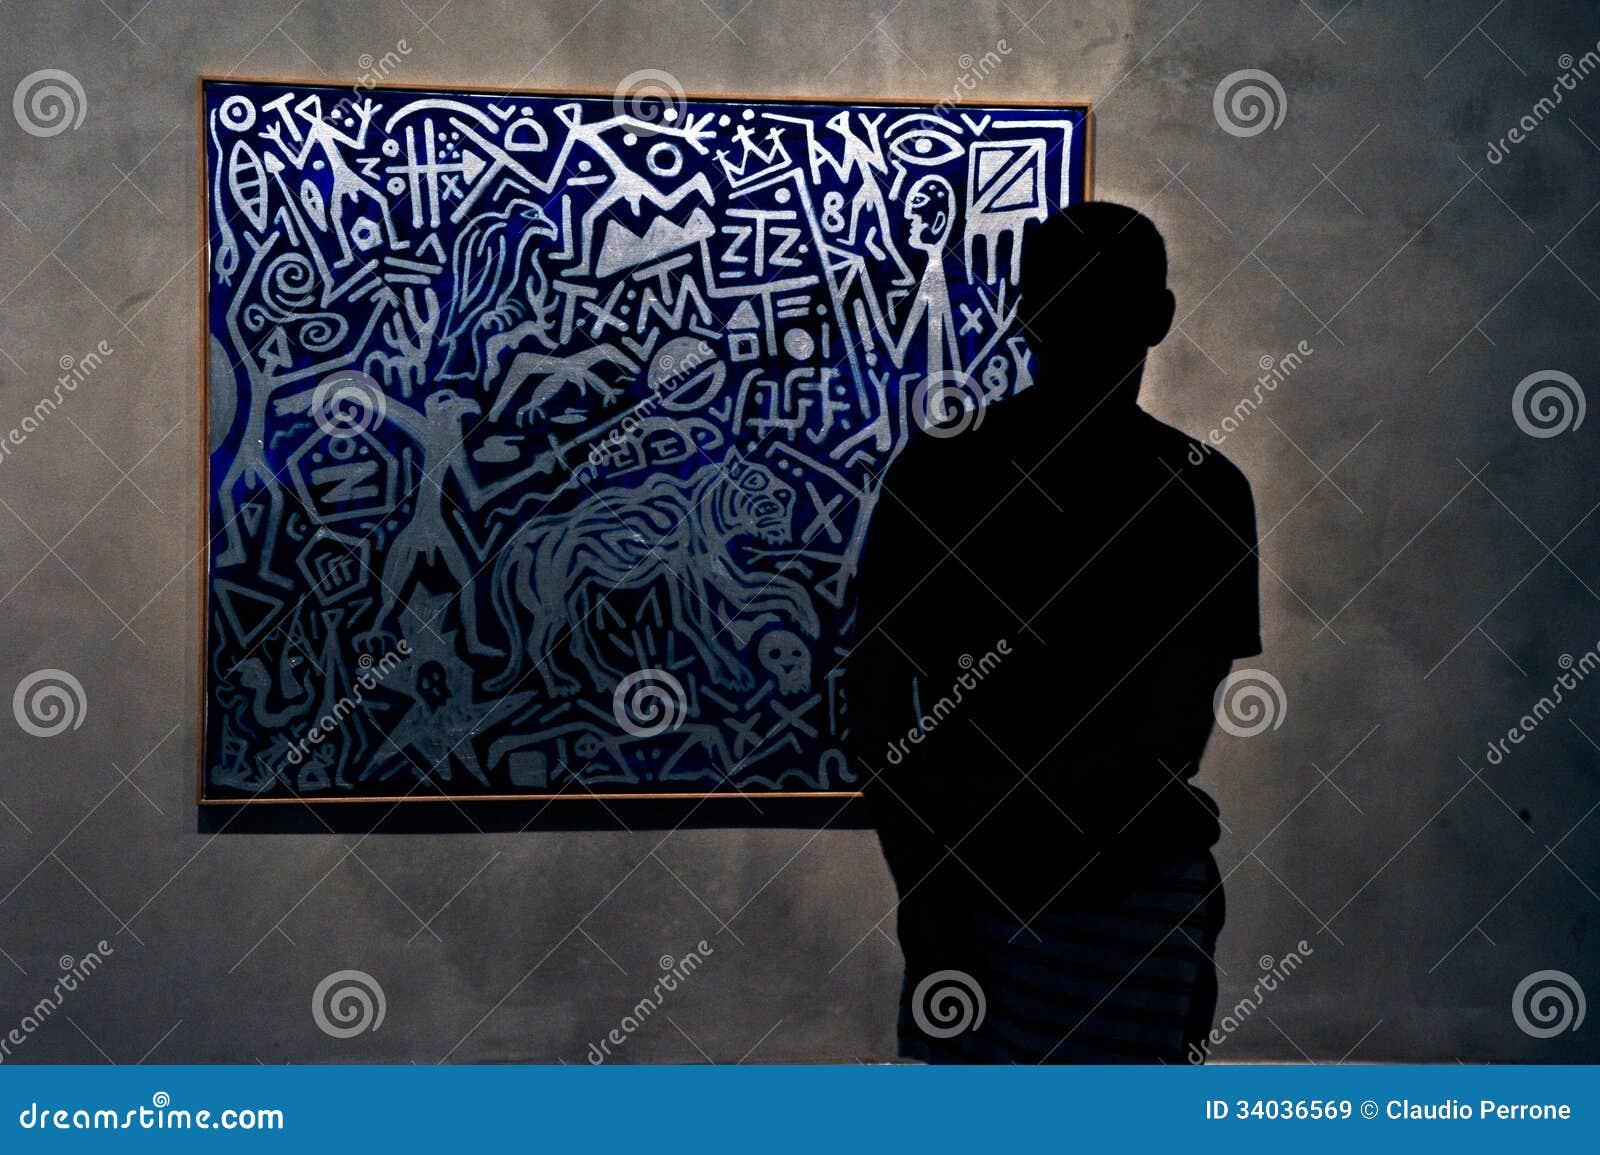 Modern Art exposicion editorial stock image  Image of irrationale